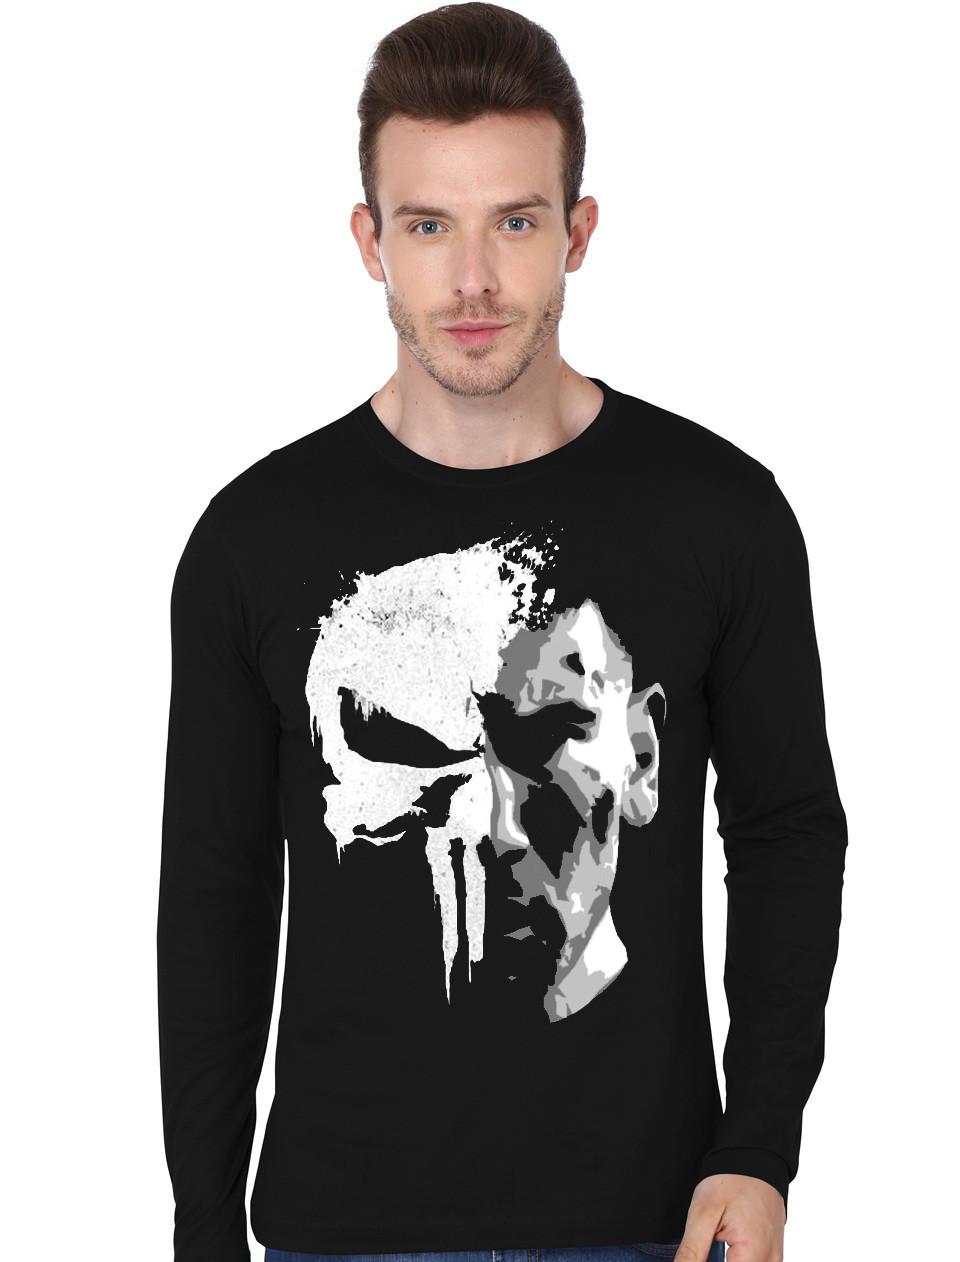 793e1109 The Punisher Skull Full Sleeve T-Shirt   Swag Shirts